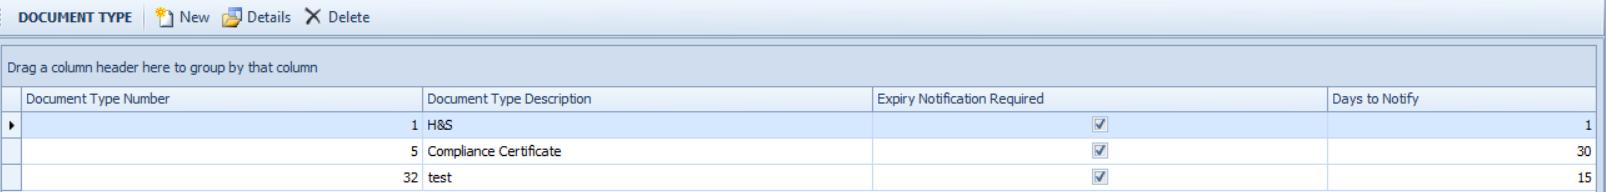 Fig 6. Vendor Document Types